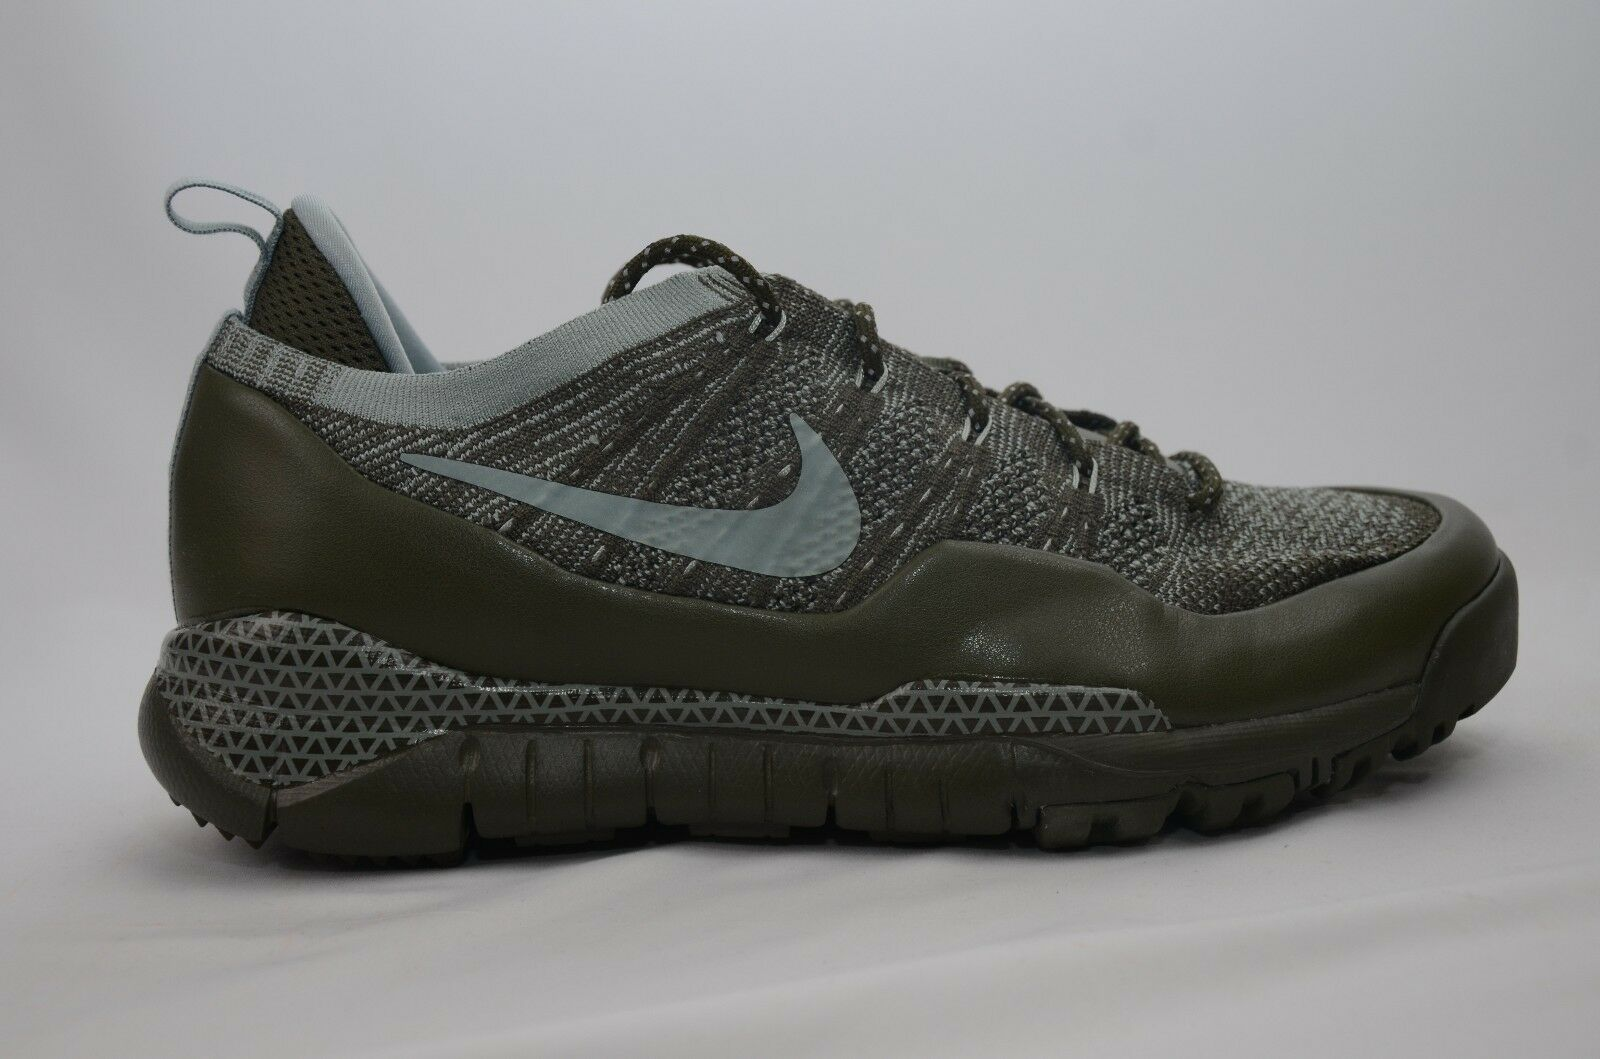 Nike Lupinek Flyknit Low Khaki/Green Uomo Size 9-11 New in Box 882685 300